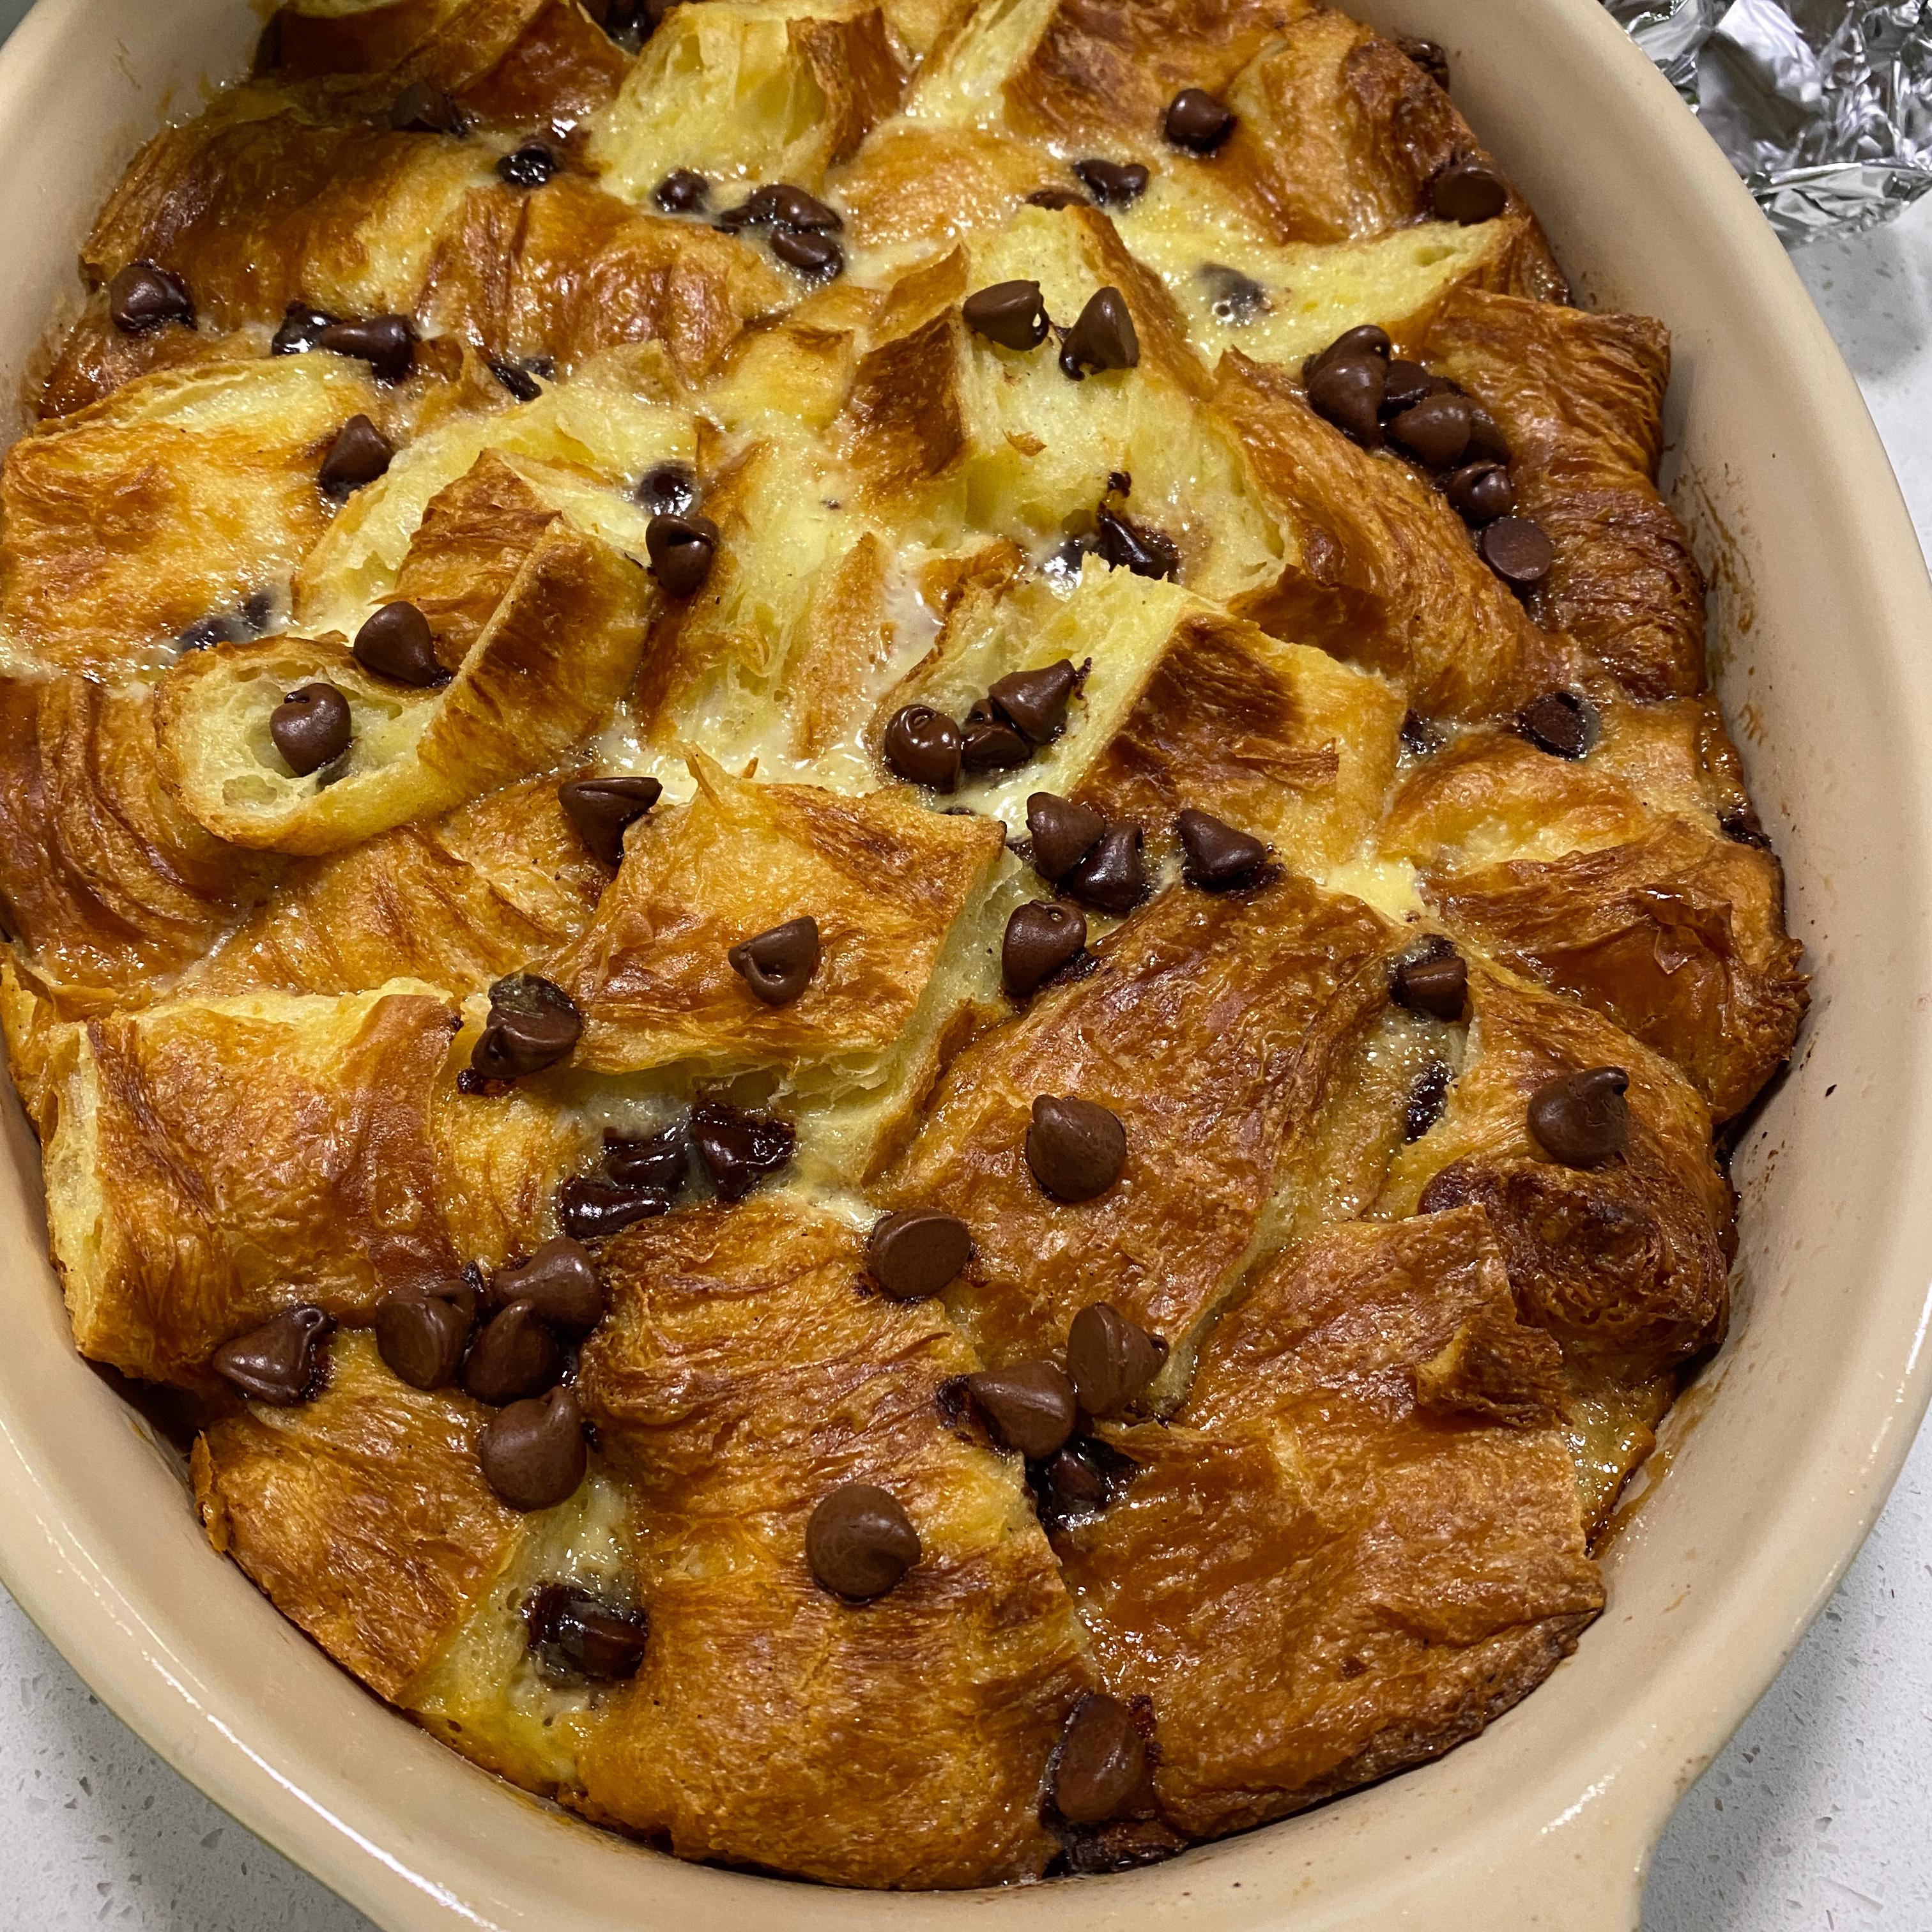 Chocolate Croissant Bread Pudding